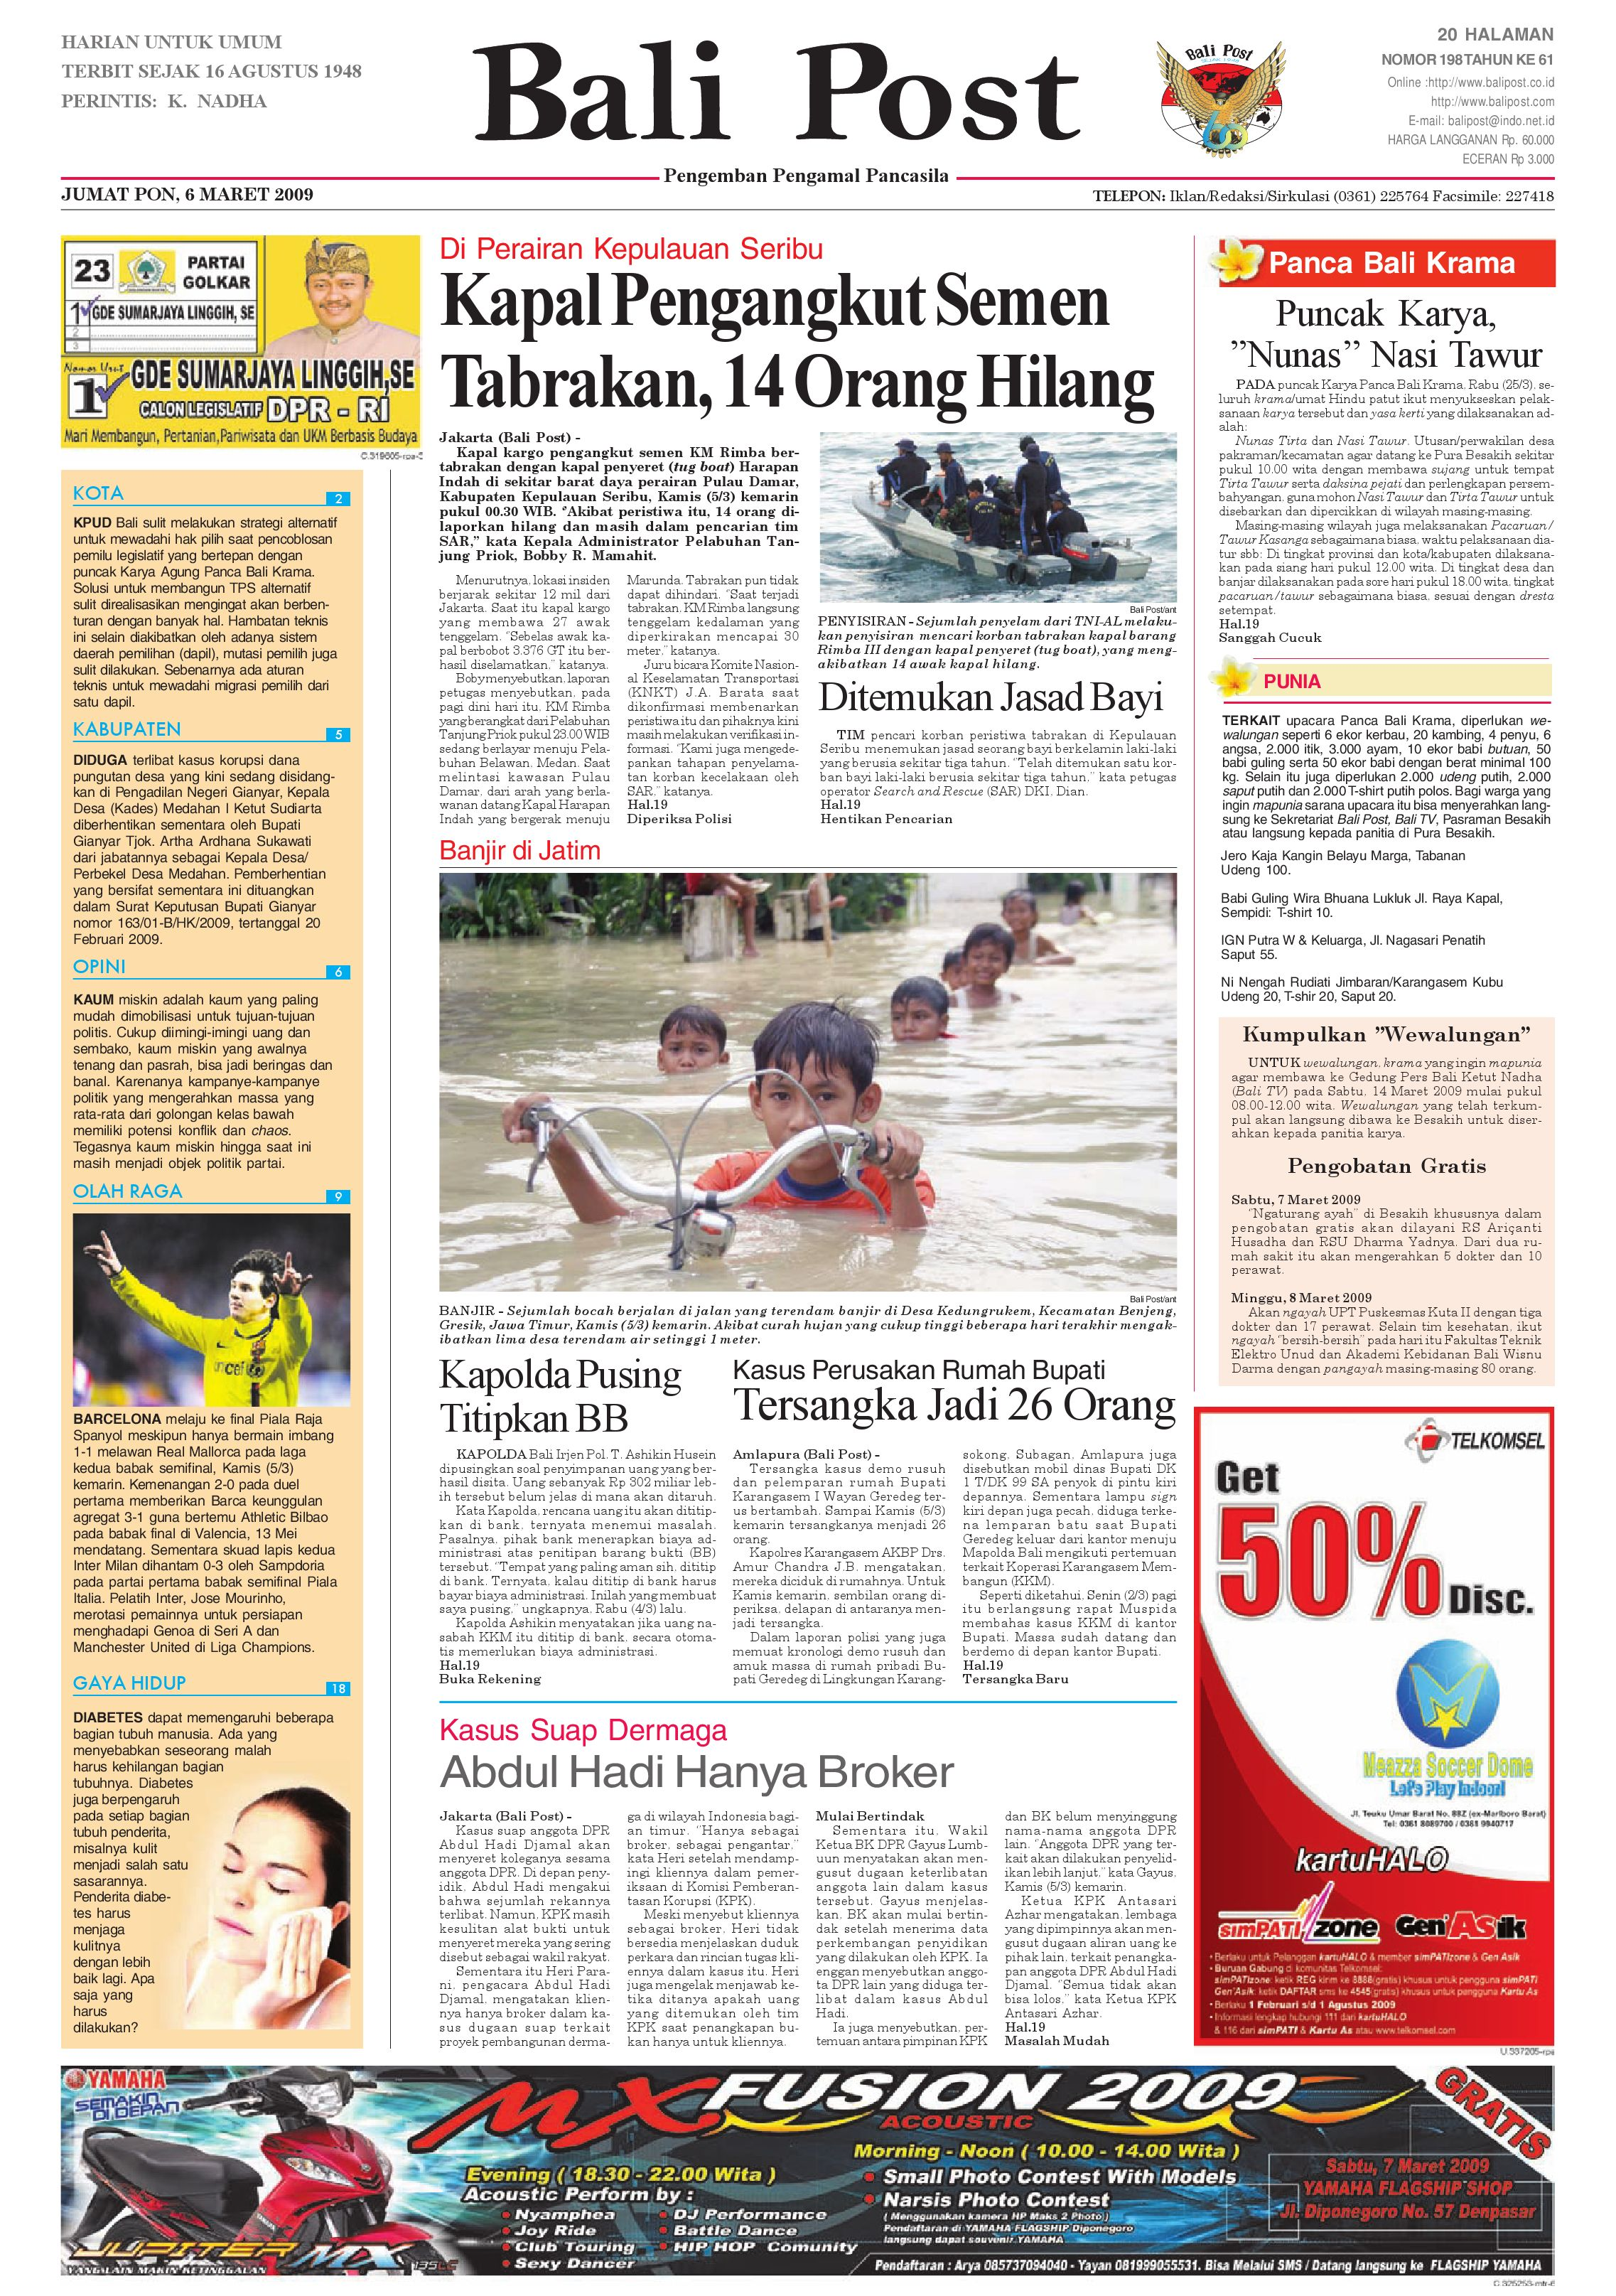 Bali Post Jumat 6 Maret 2009 By E Paper Kmb Issuu Voucher 300 Plus Tiara Gatzu Monang Maning Toko Soputan